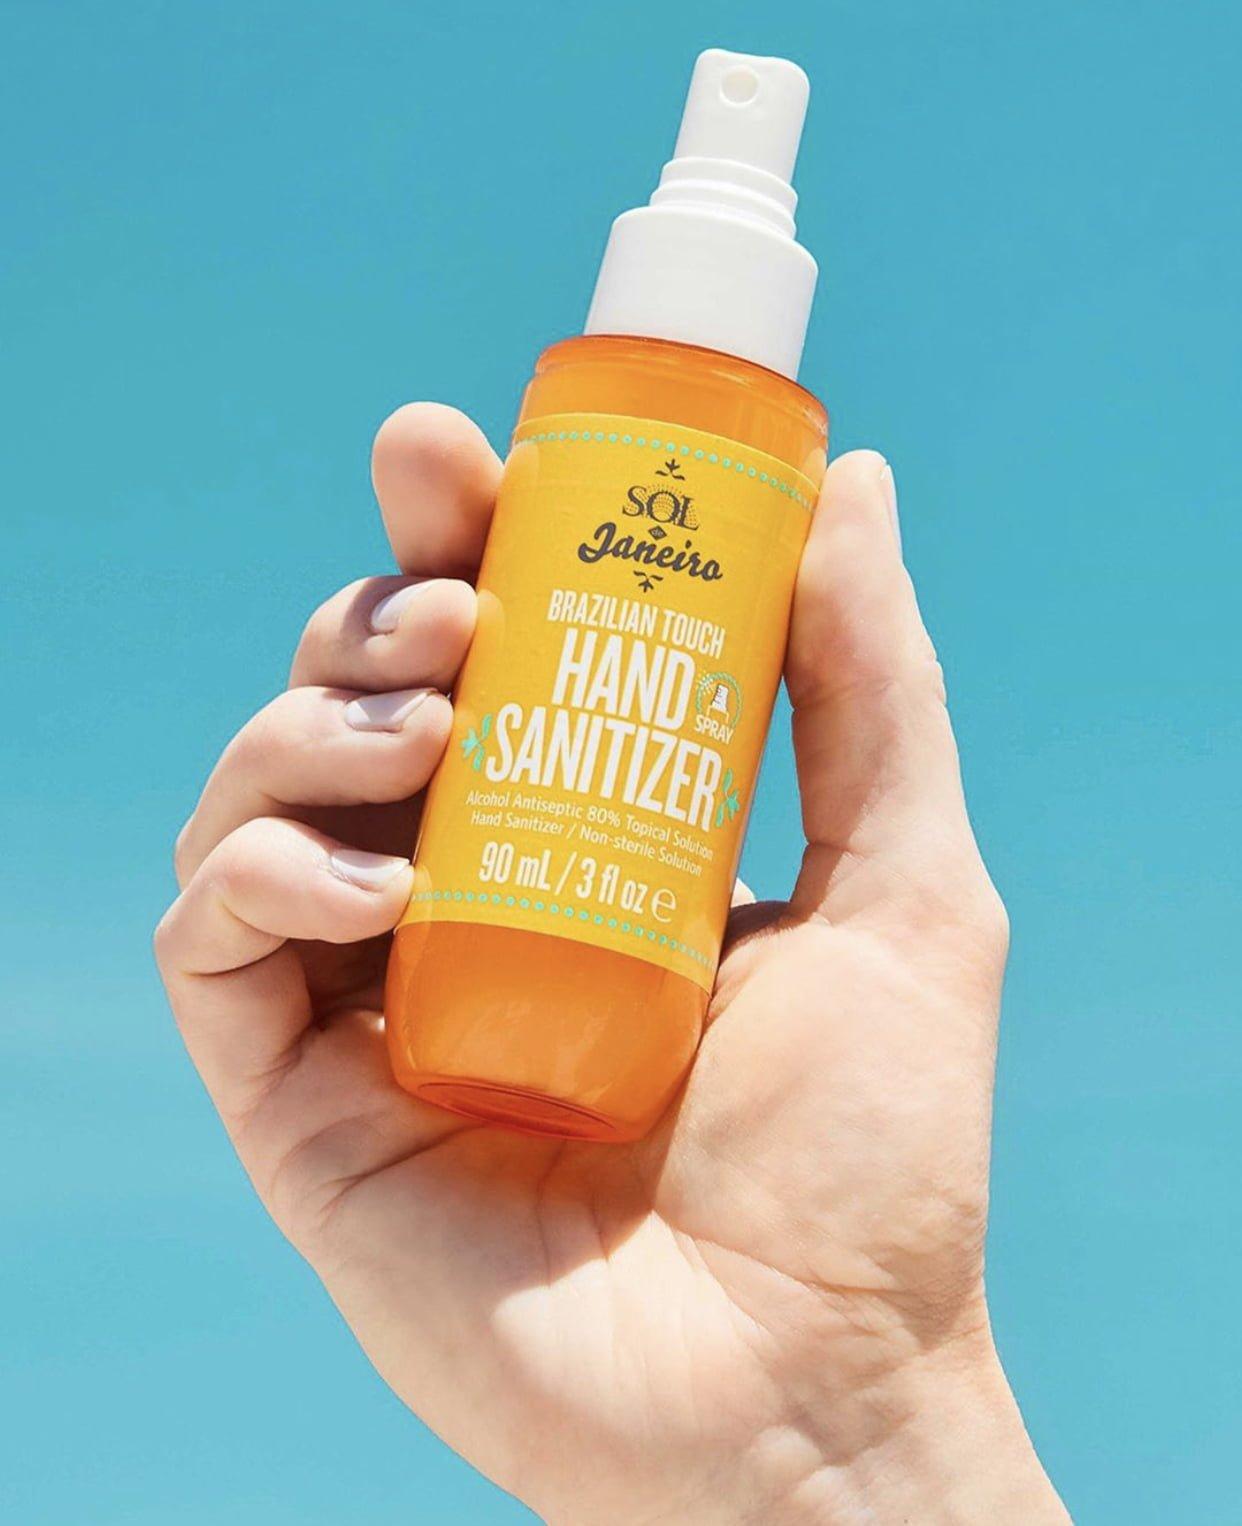 Sol de Janeiro Brazilian Touch Hand Sanitizer